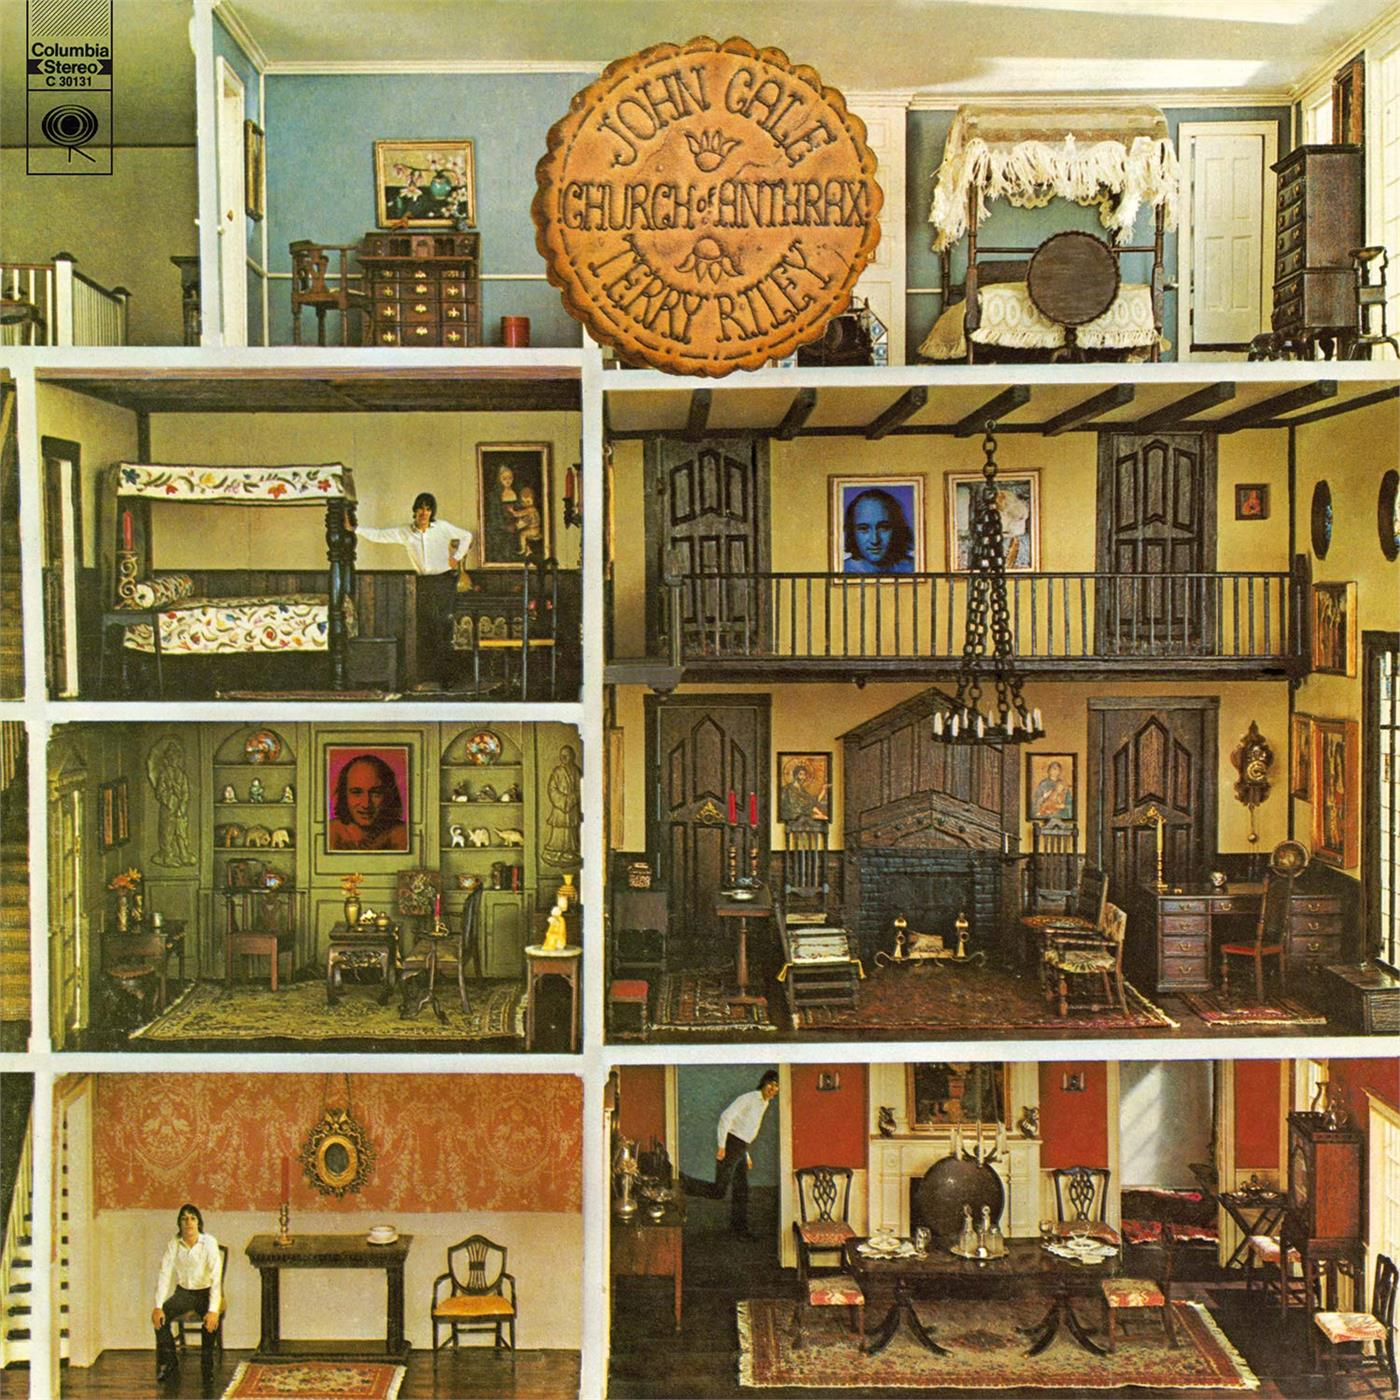 John Cale & Terry Riley - Church Of Anthrax [LP]